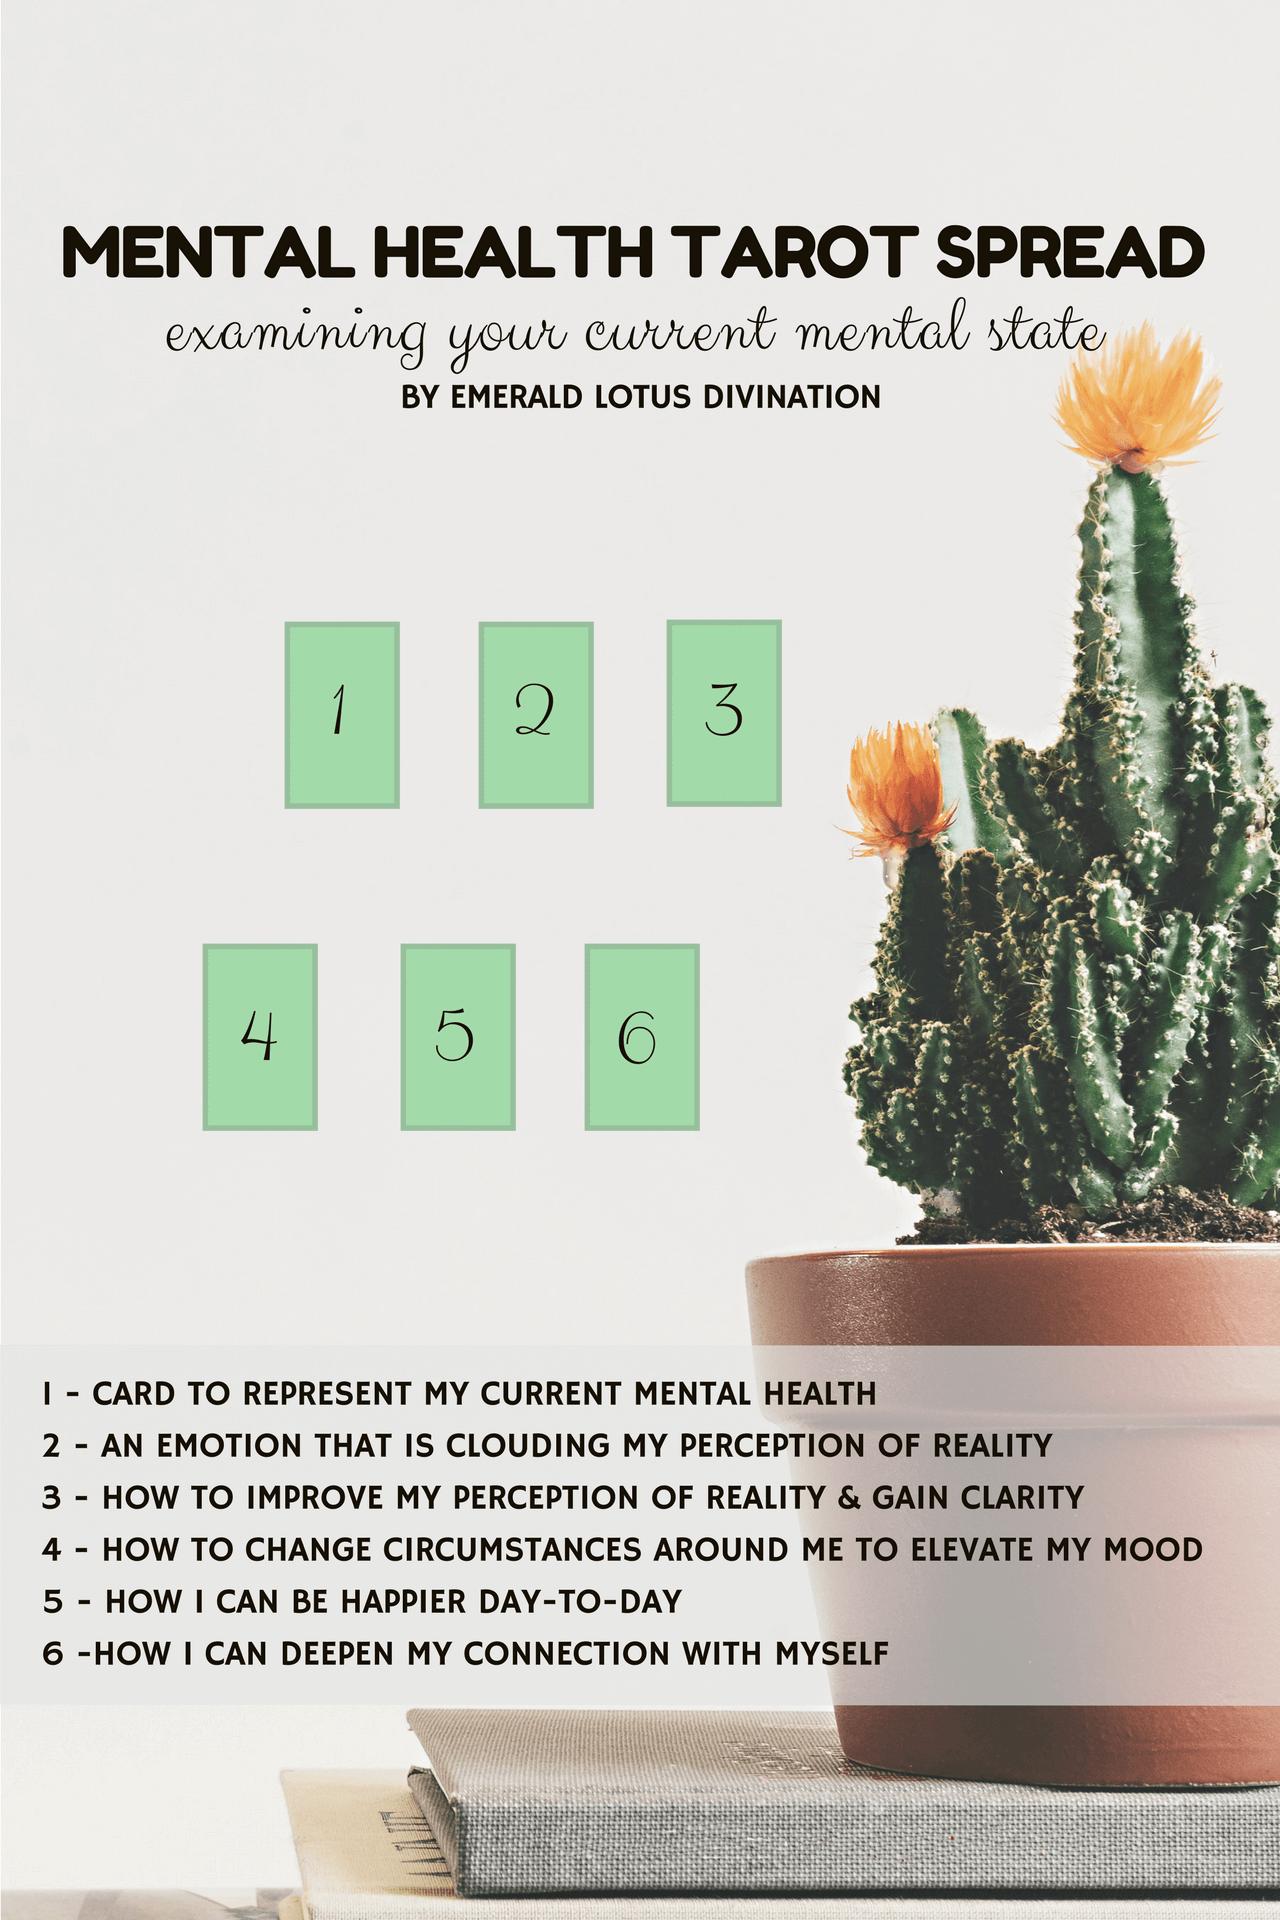 mental-health-self-awareness-self-improvement-illness-free-tarot-spread-1.png